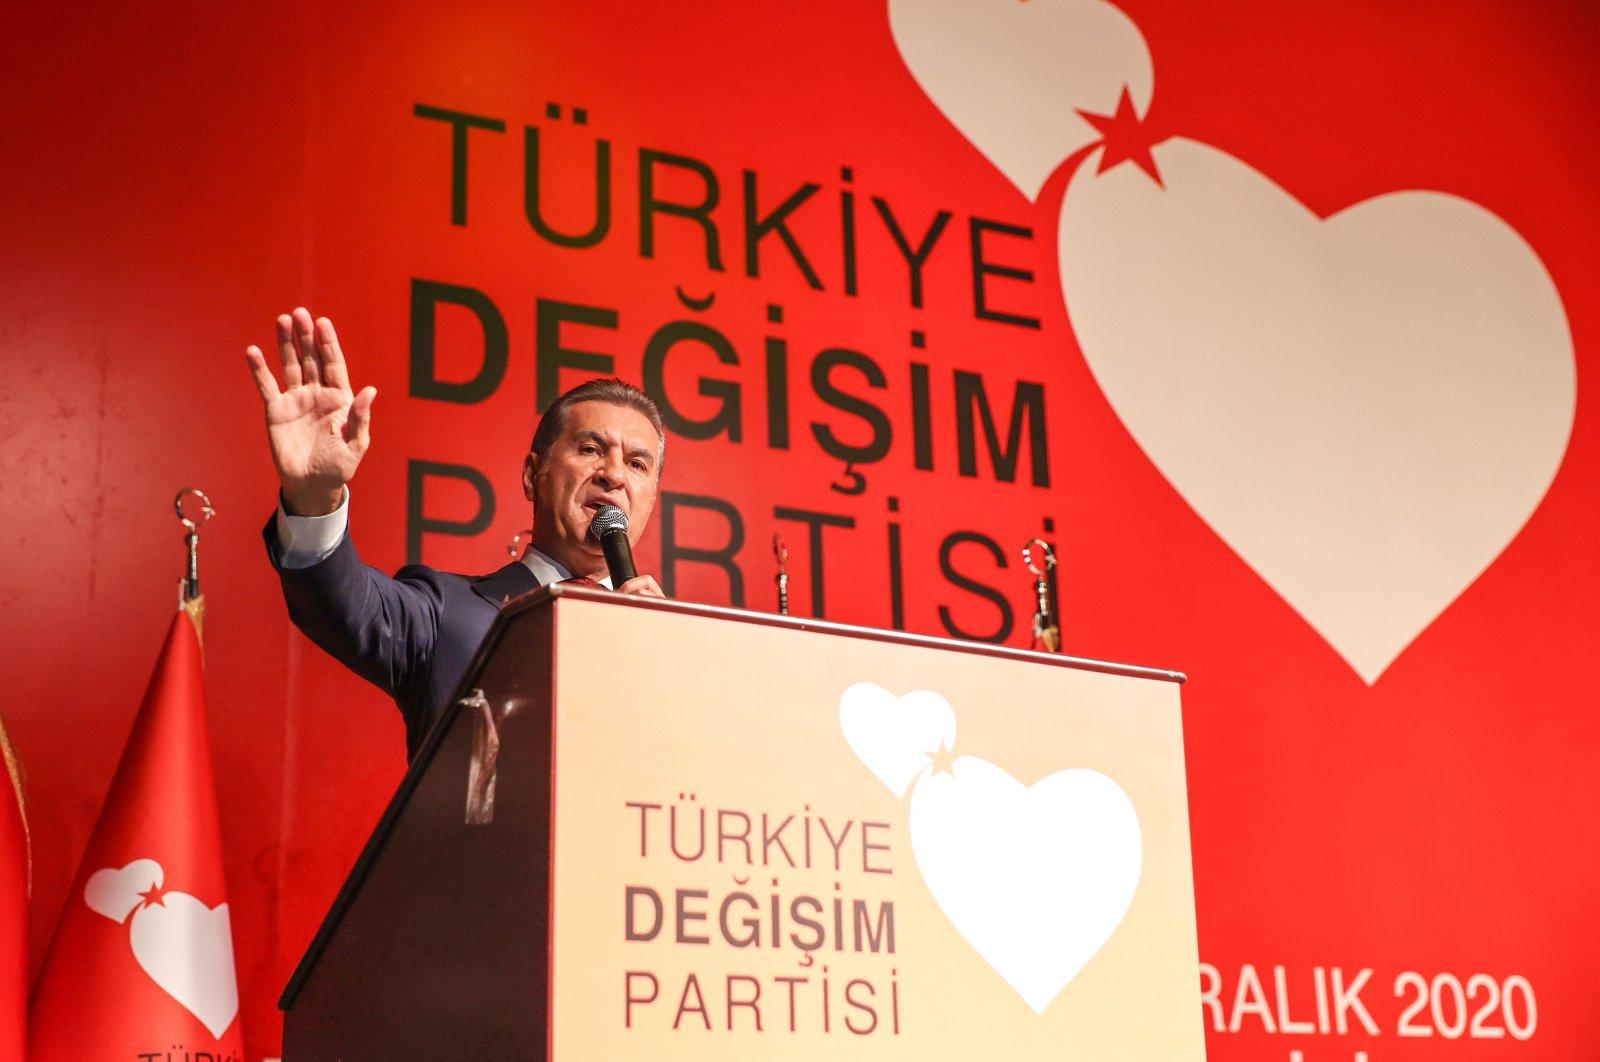 Former Şişli district Mayor Mustafa Sarıgül speaks at the launching ceremony of his party in Istanbul, Turkey, Dec. 17, 2020. (AA Photo)